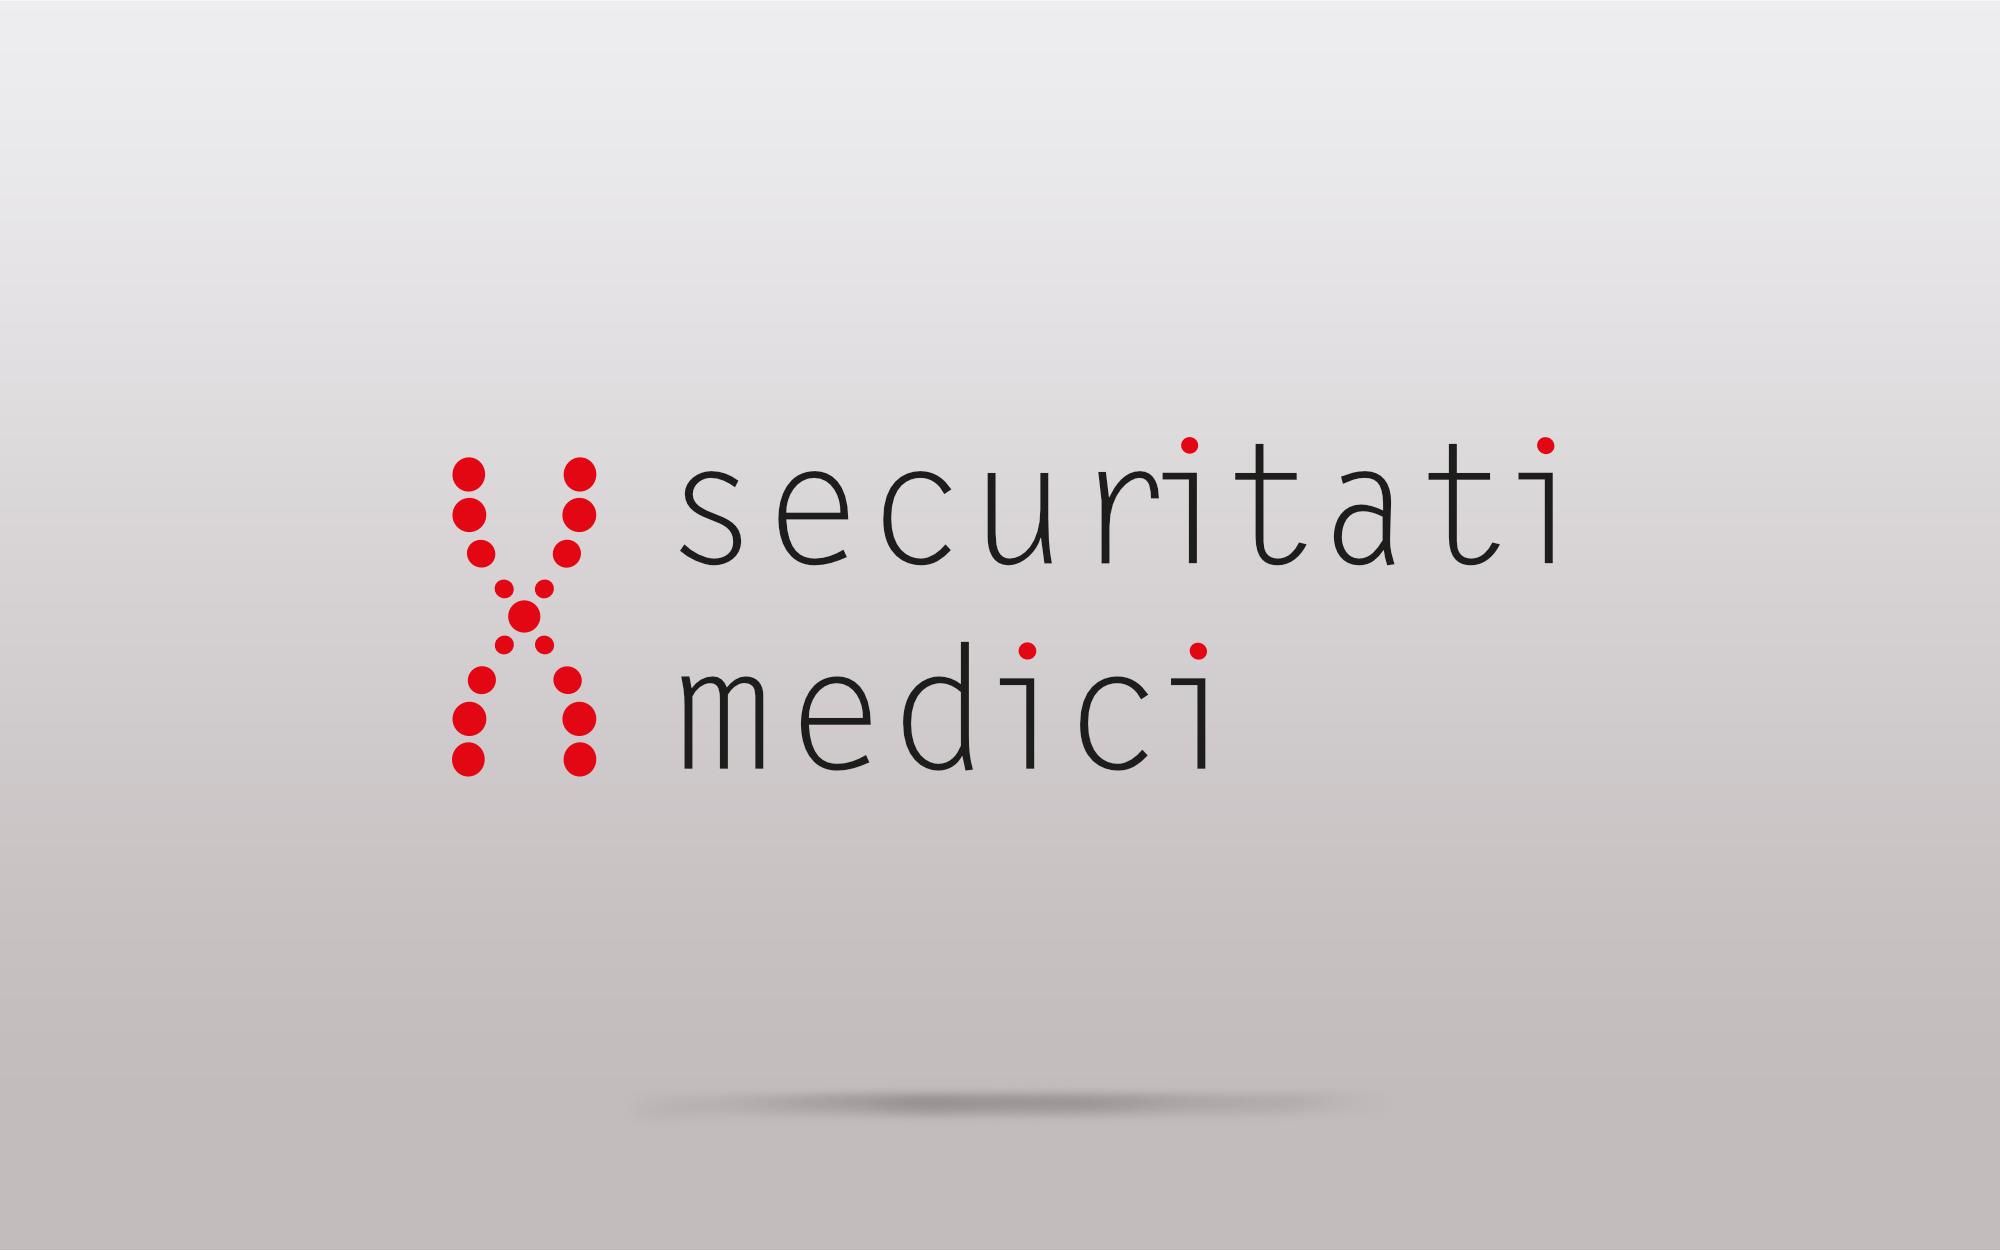 securitati medici - Logo